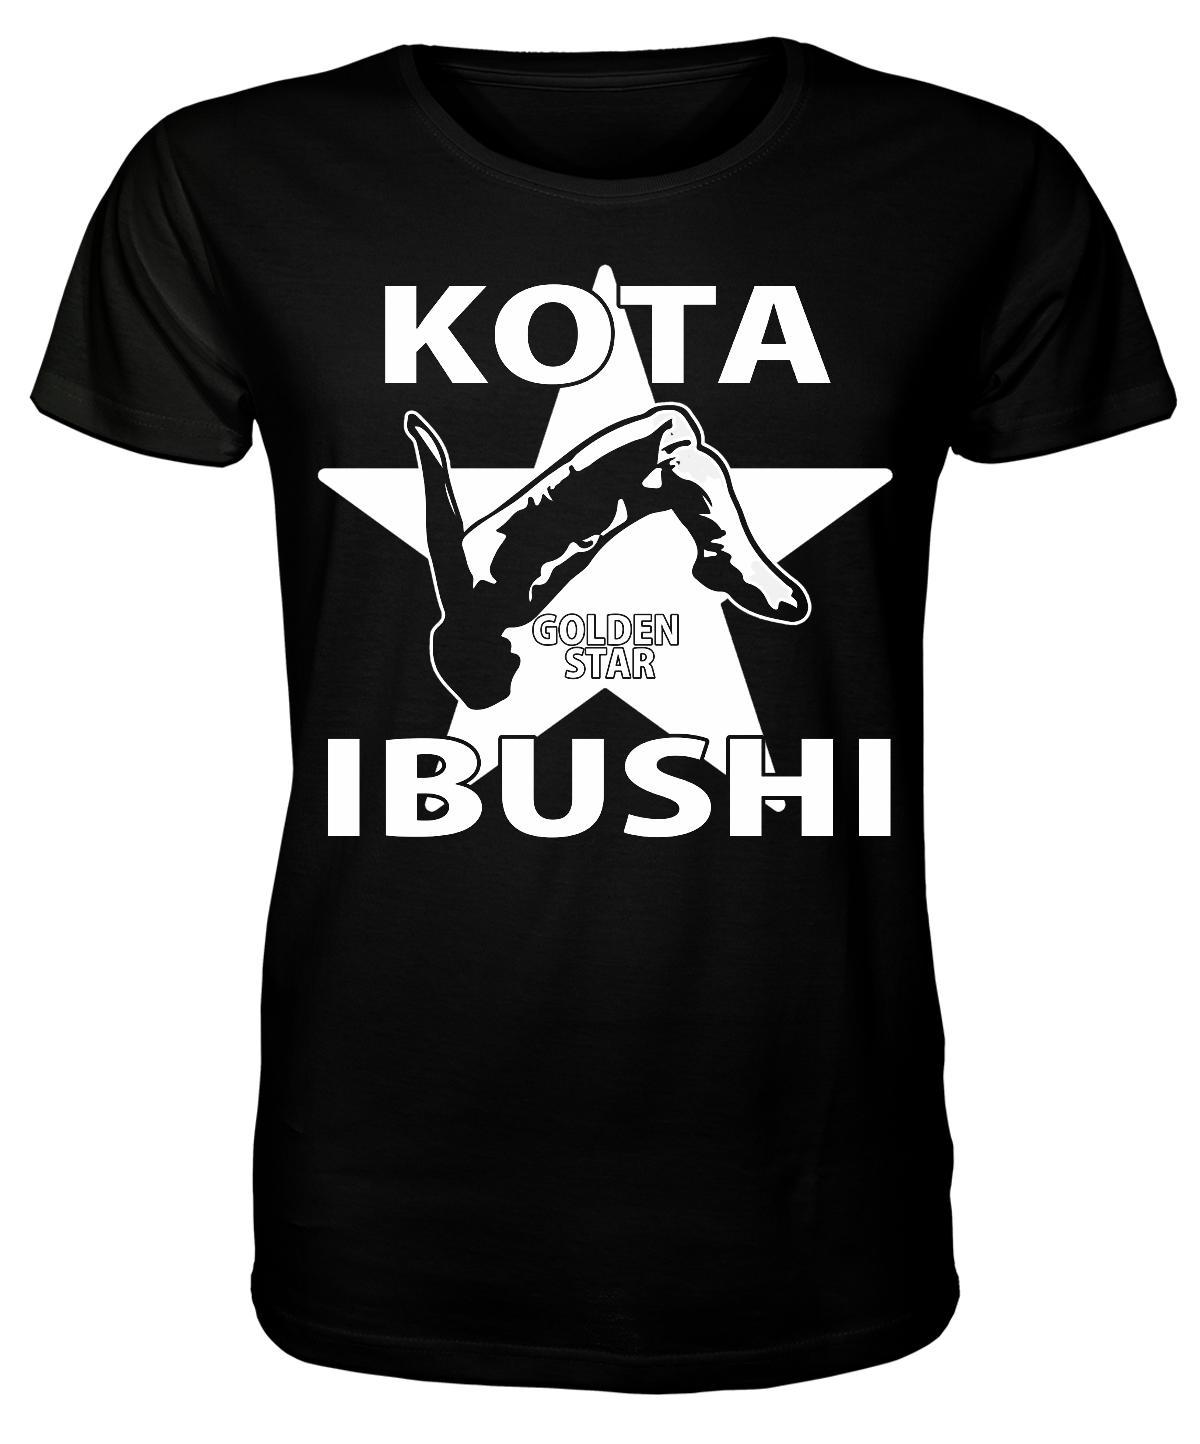 53d905cad372f9 Kota Ibushi - Golden Star Press, New Japan, Bullet Club,Kenny omega, Goldenlovers 2018 Men'S Lastest Fashion Short Sleeve Printed funny